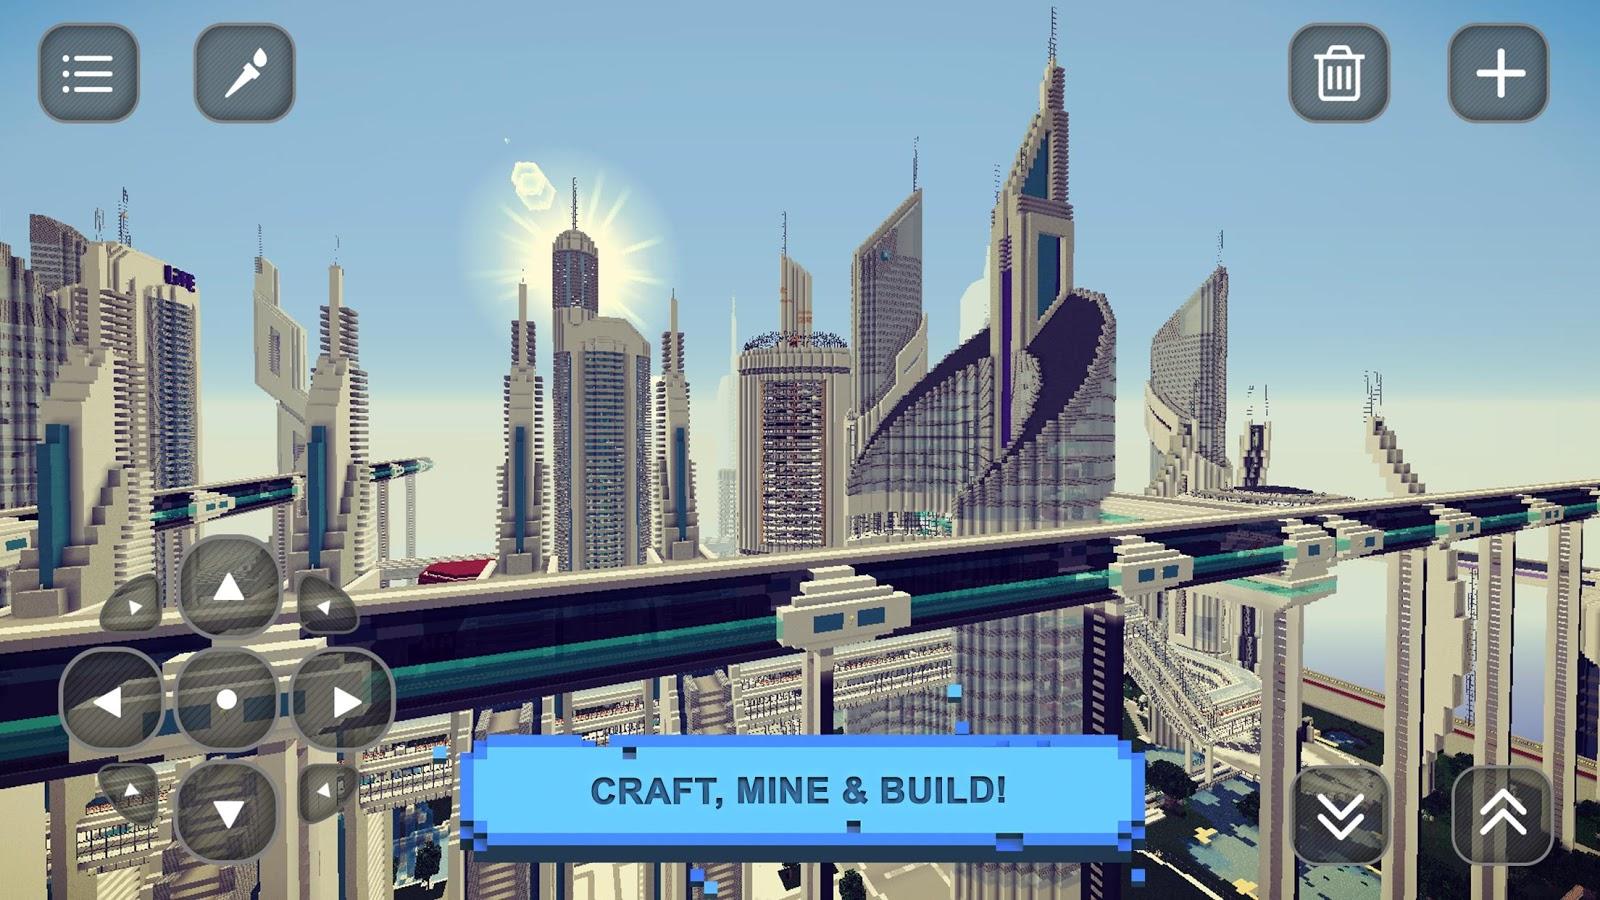 City build craft exploration 116 apk download android simulation city build craft exploration 116 screenshot 6 malvernweather Choice Image